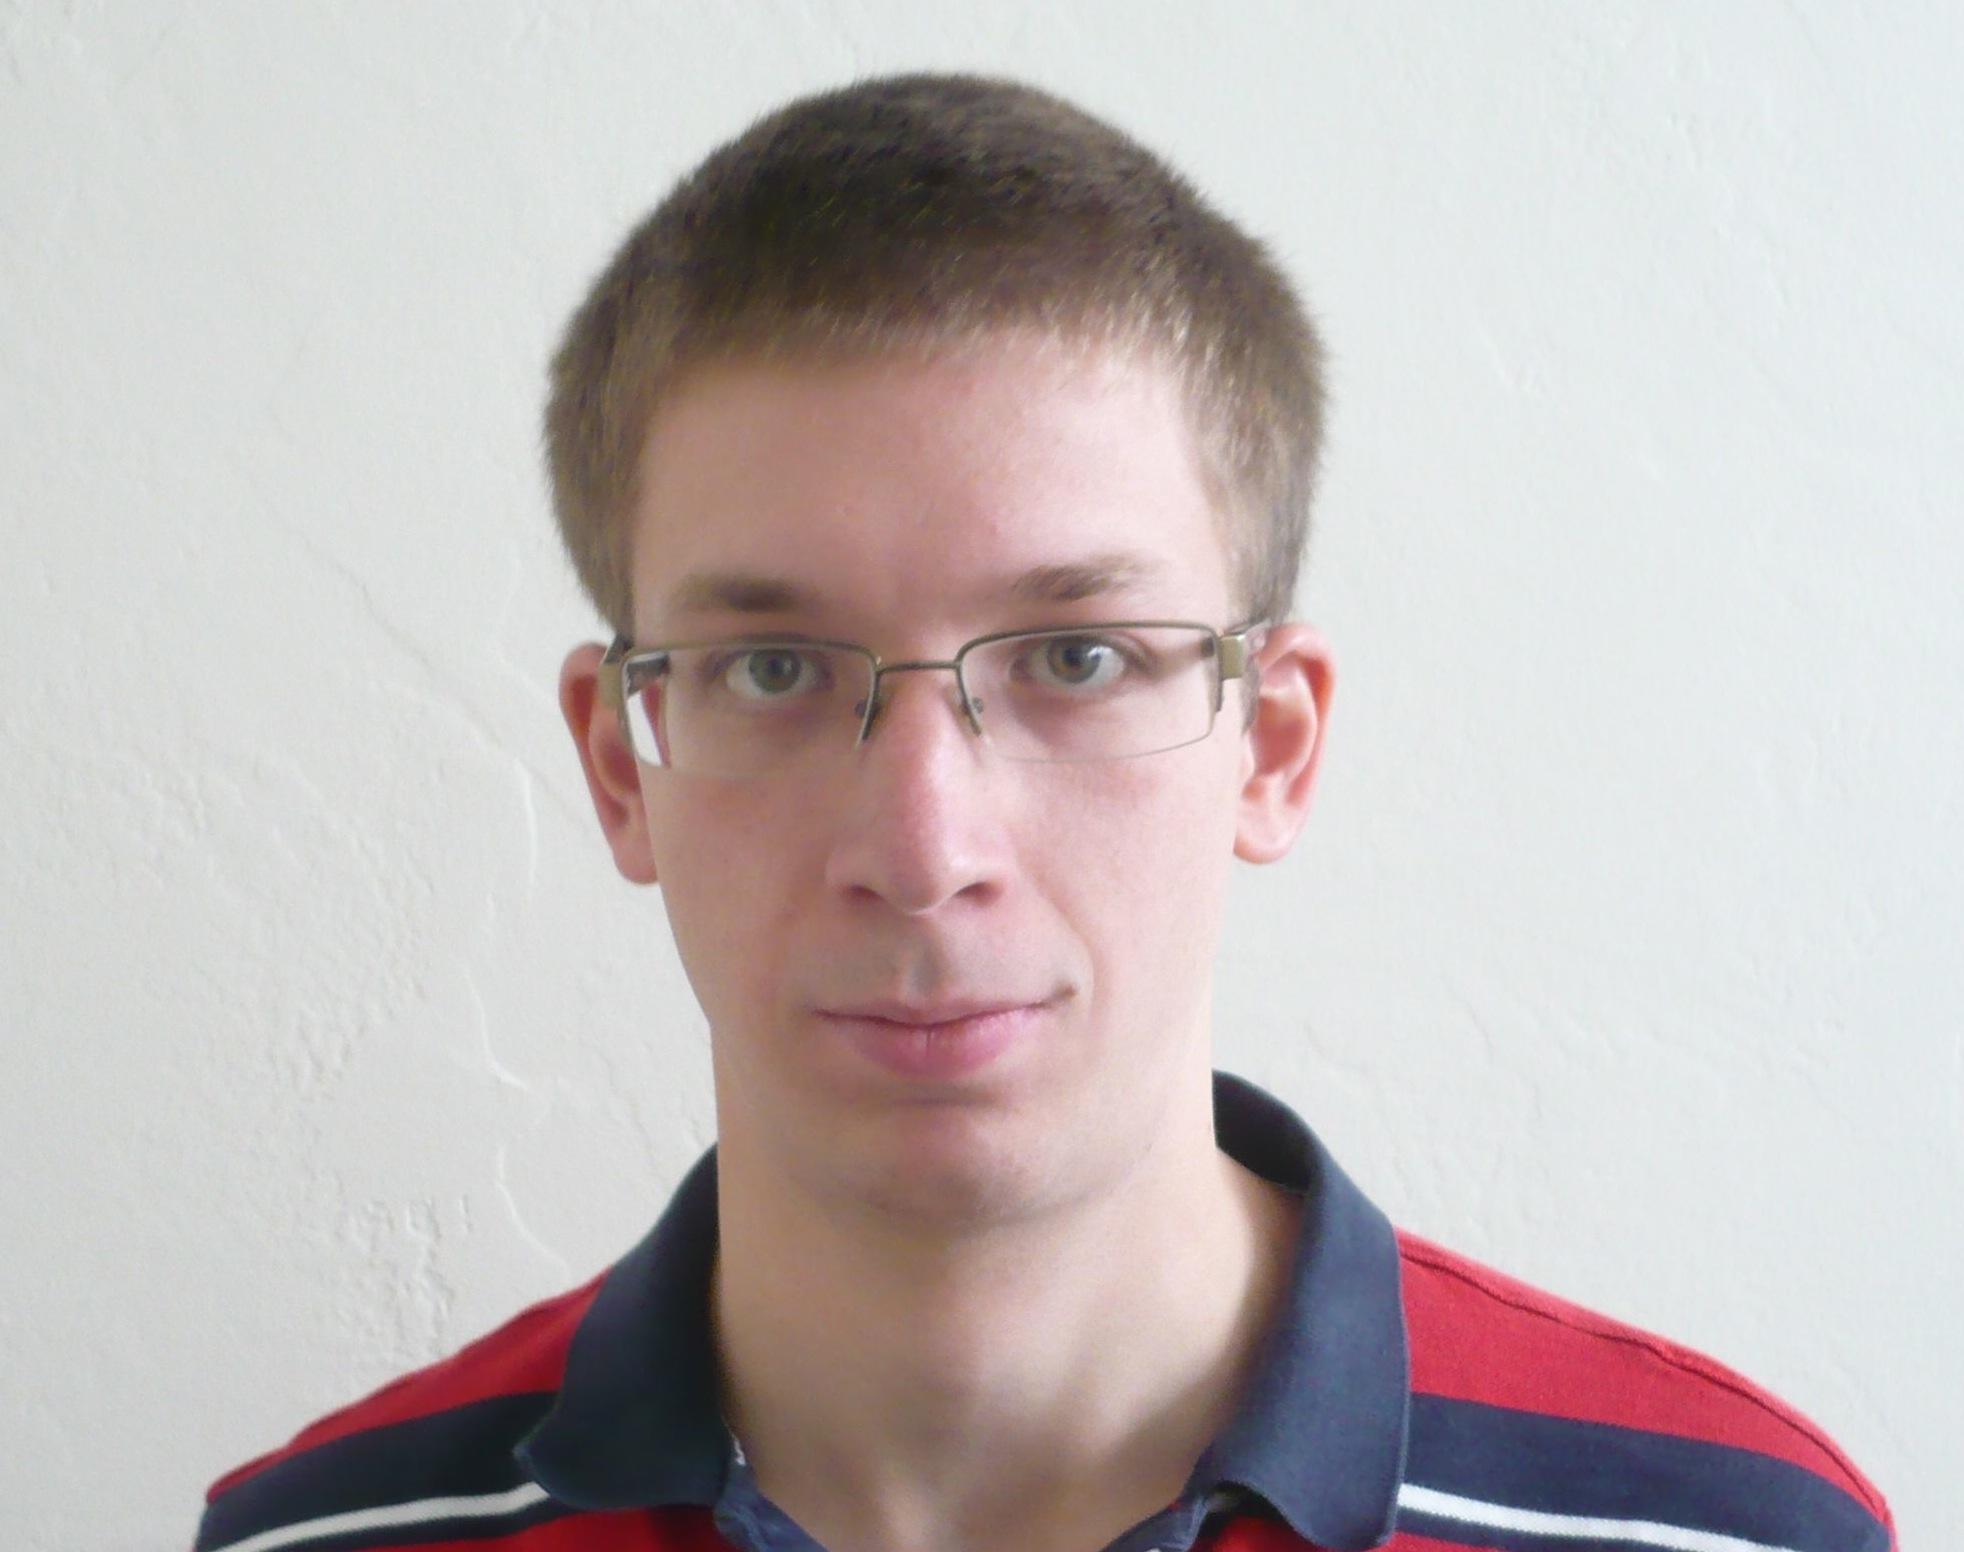 Databricks co-founder and CTO Matei Zaharia. Source: Databricks